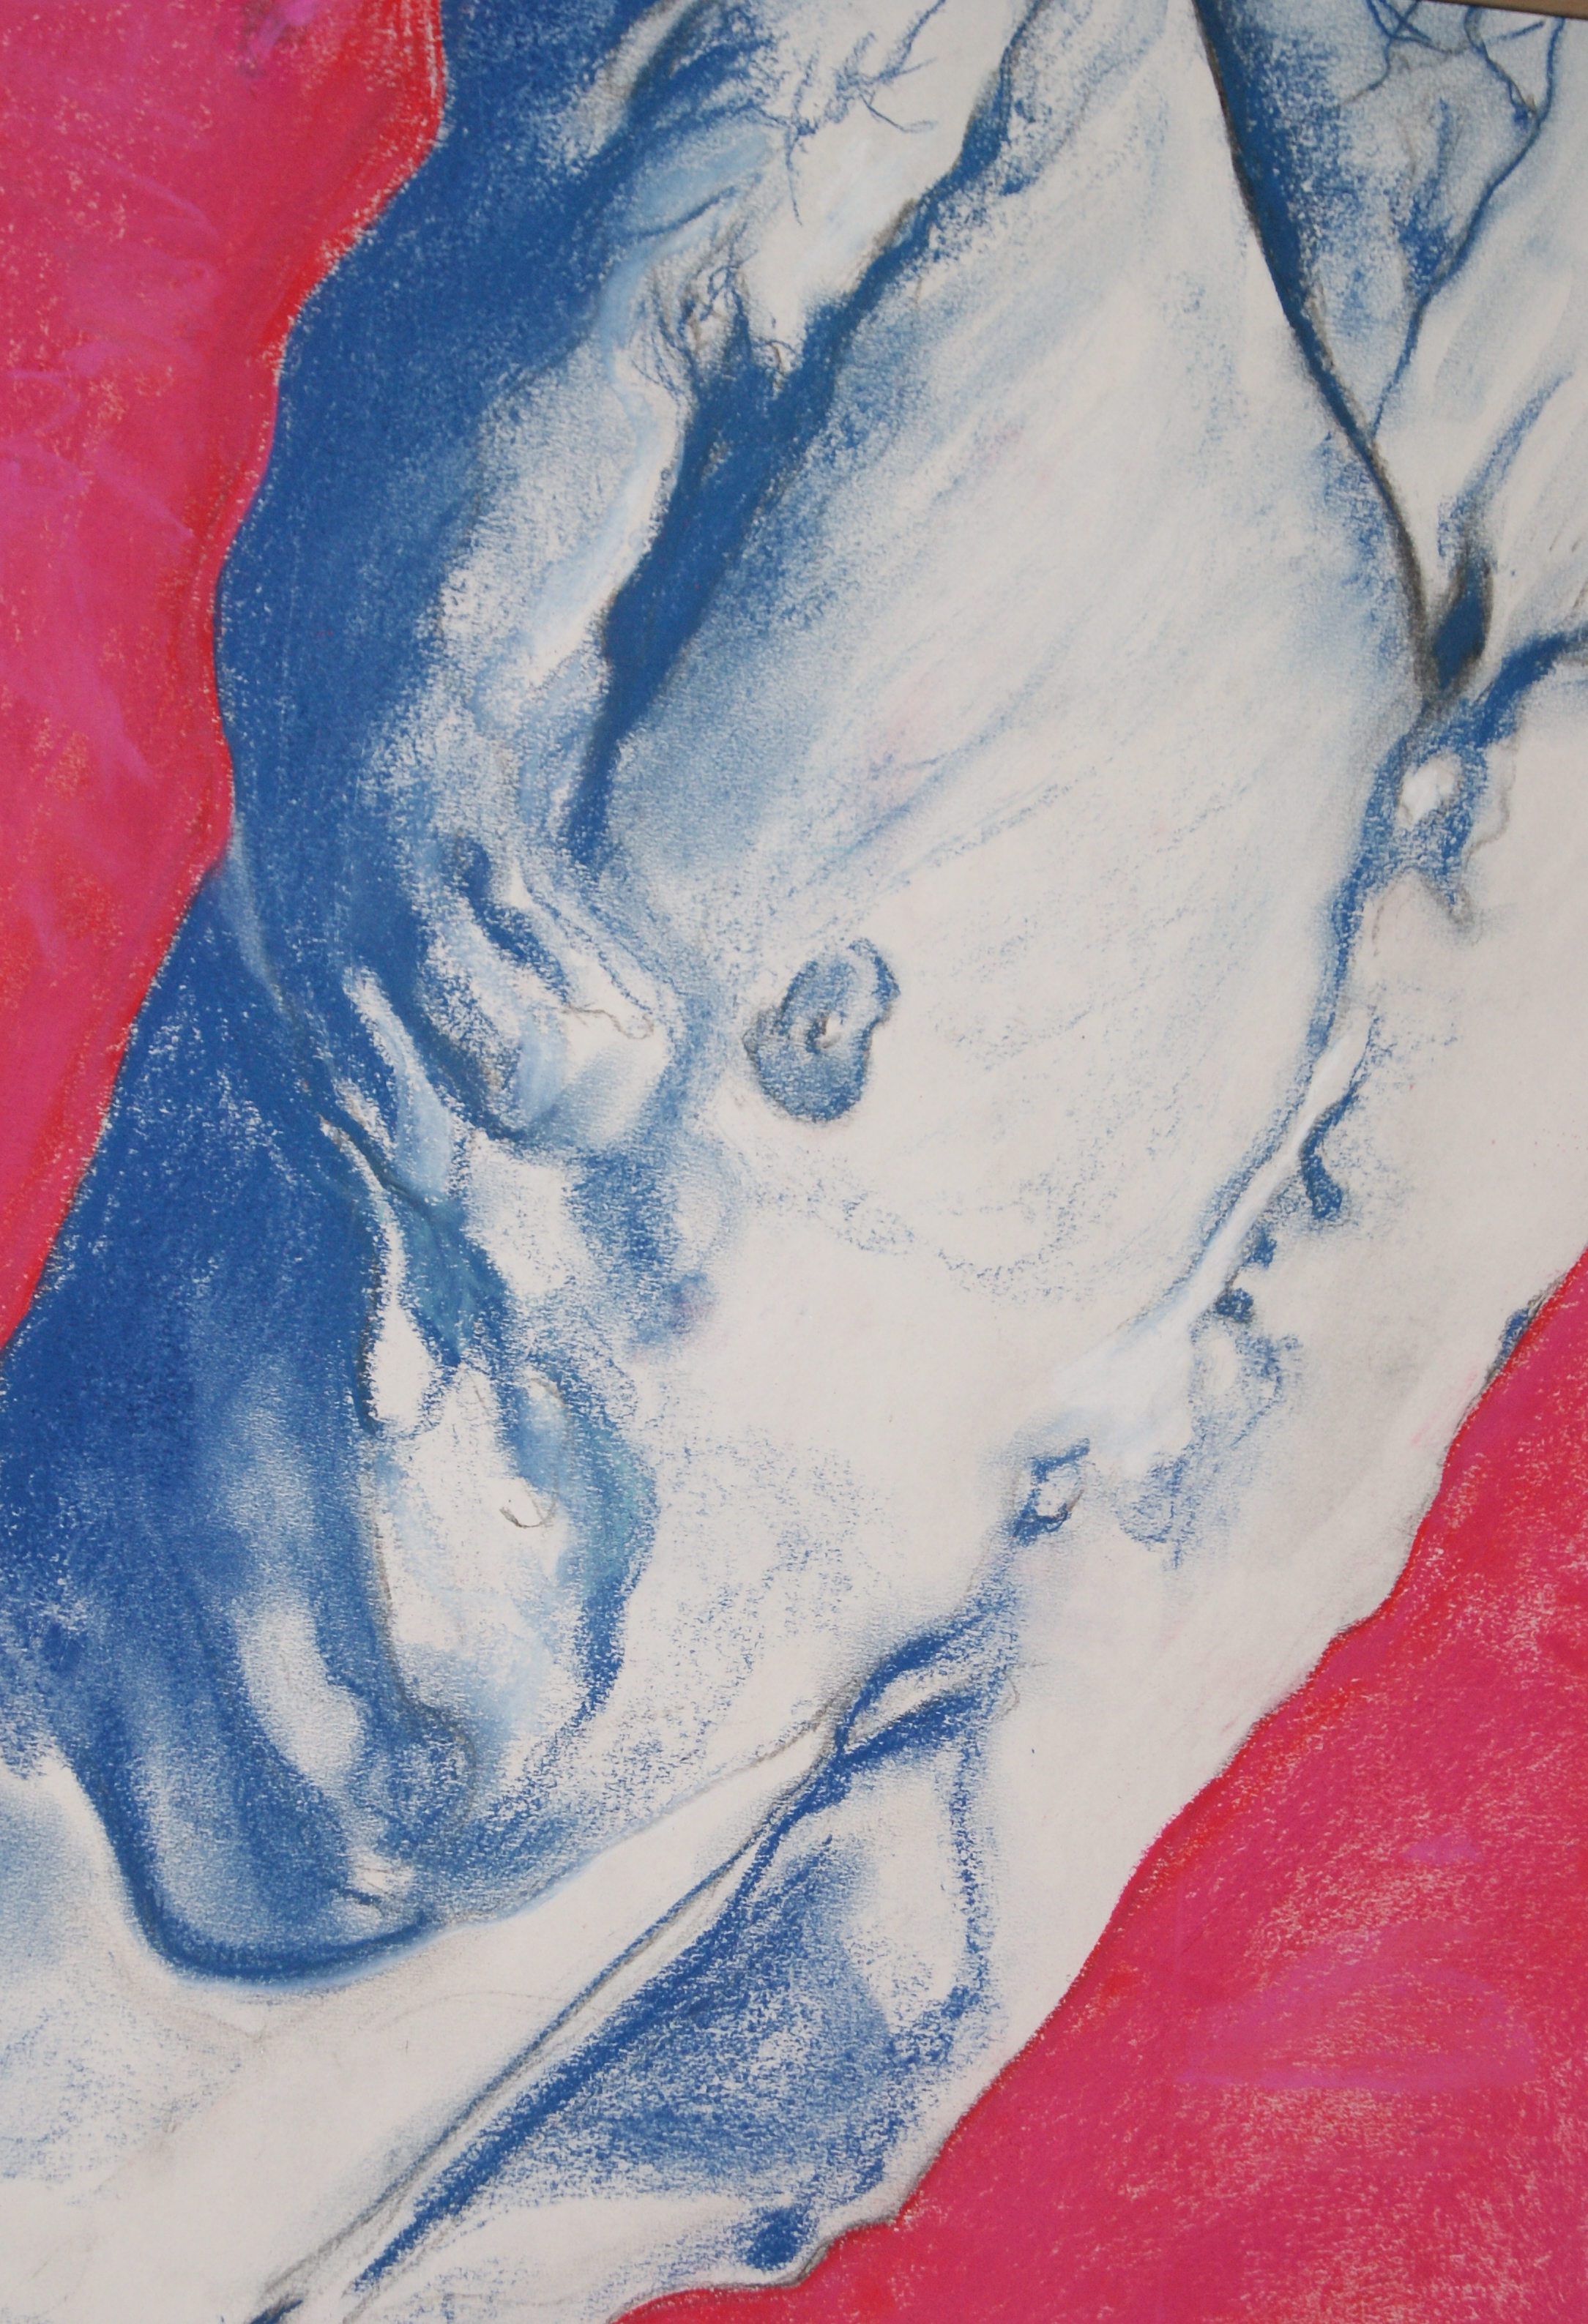 Pastel torso